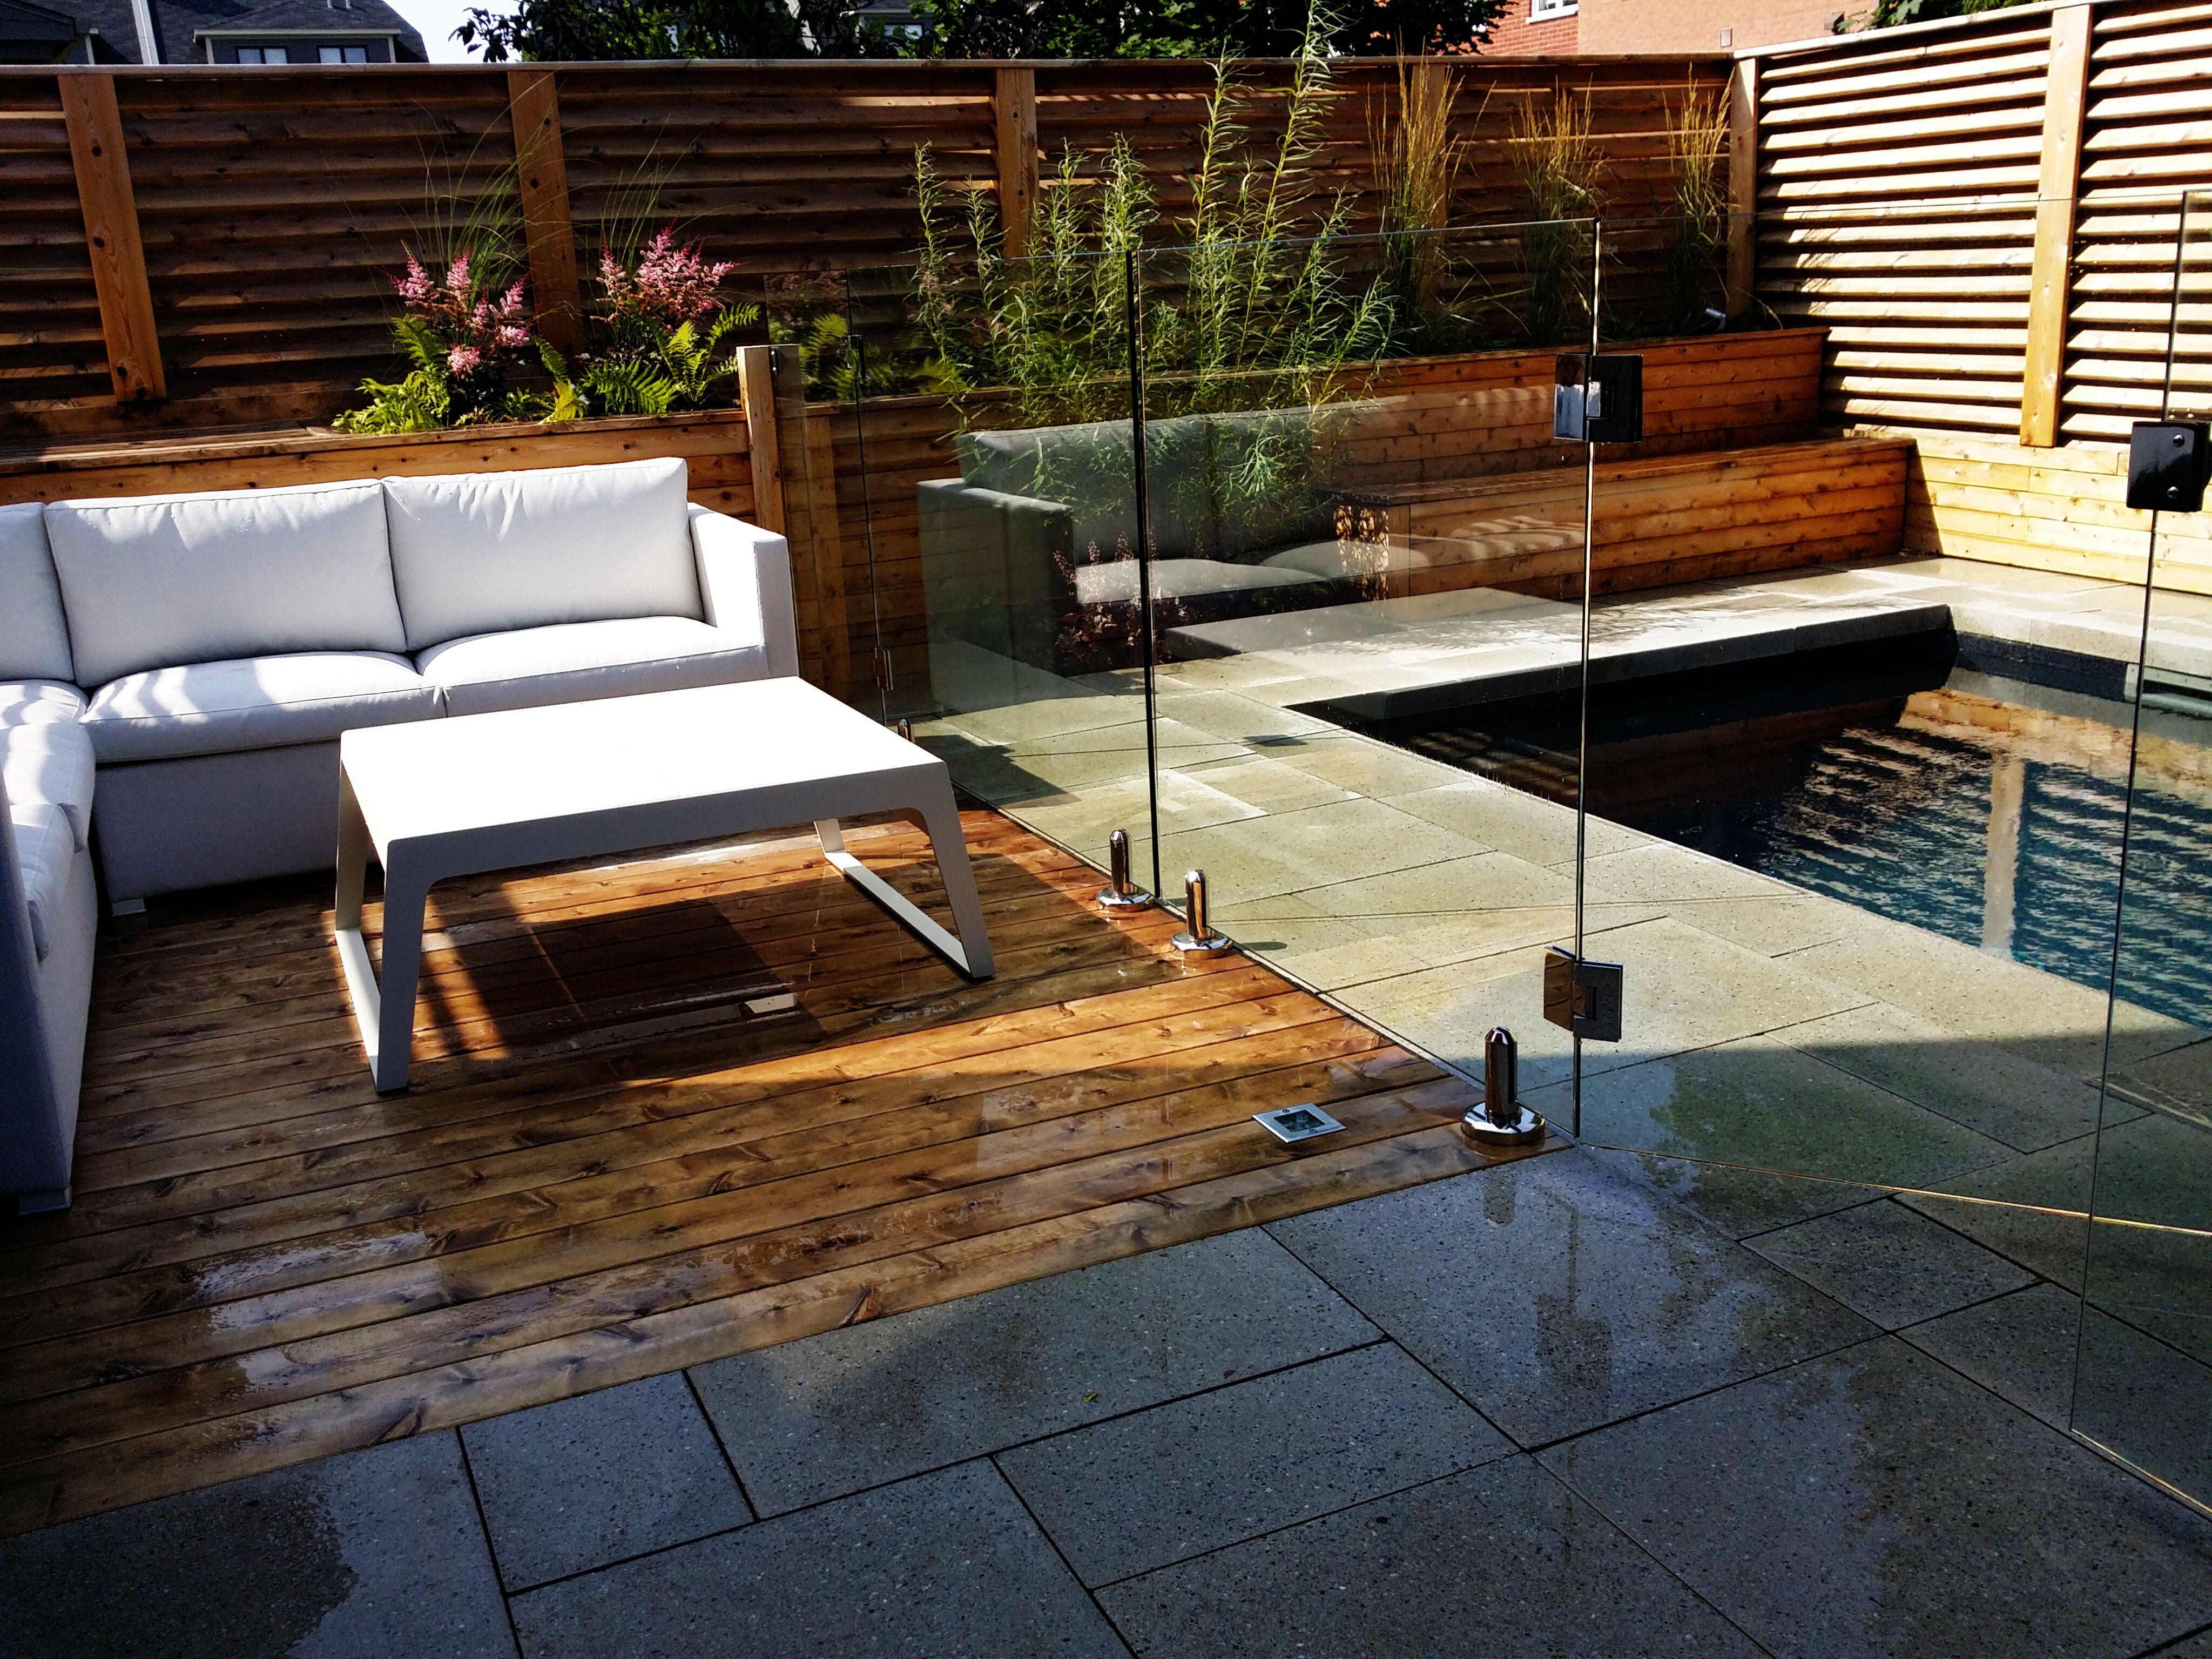 Terrasse en bois de c dre avec lumi res encastr es cran for Ecran exterieur